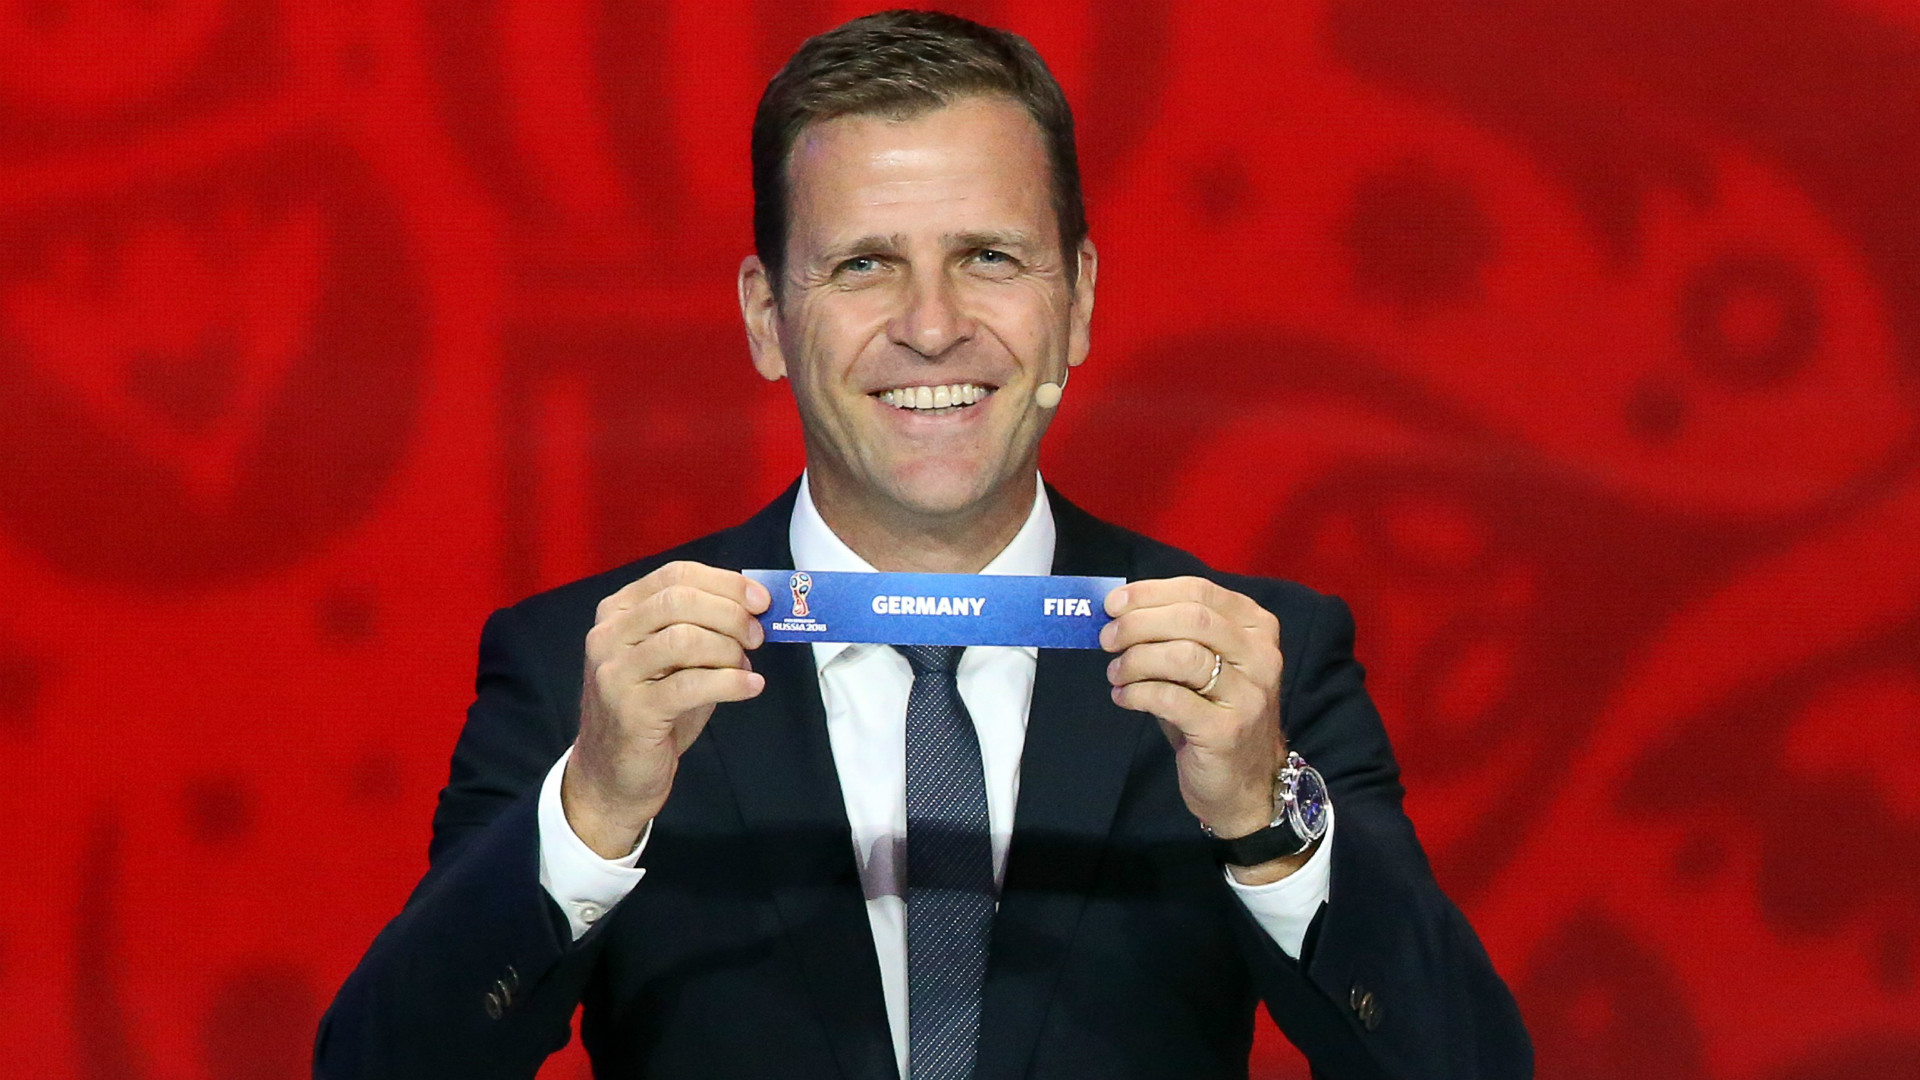 Oliver Bierhoff FIFA World Cup Qualification Draw